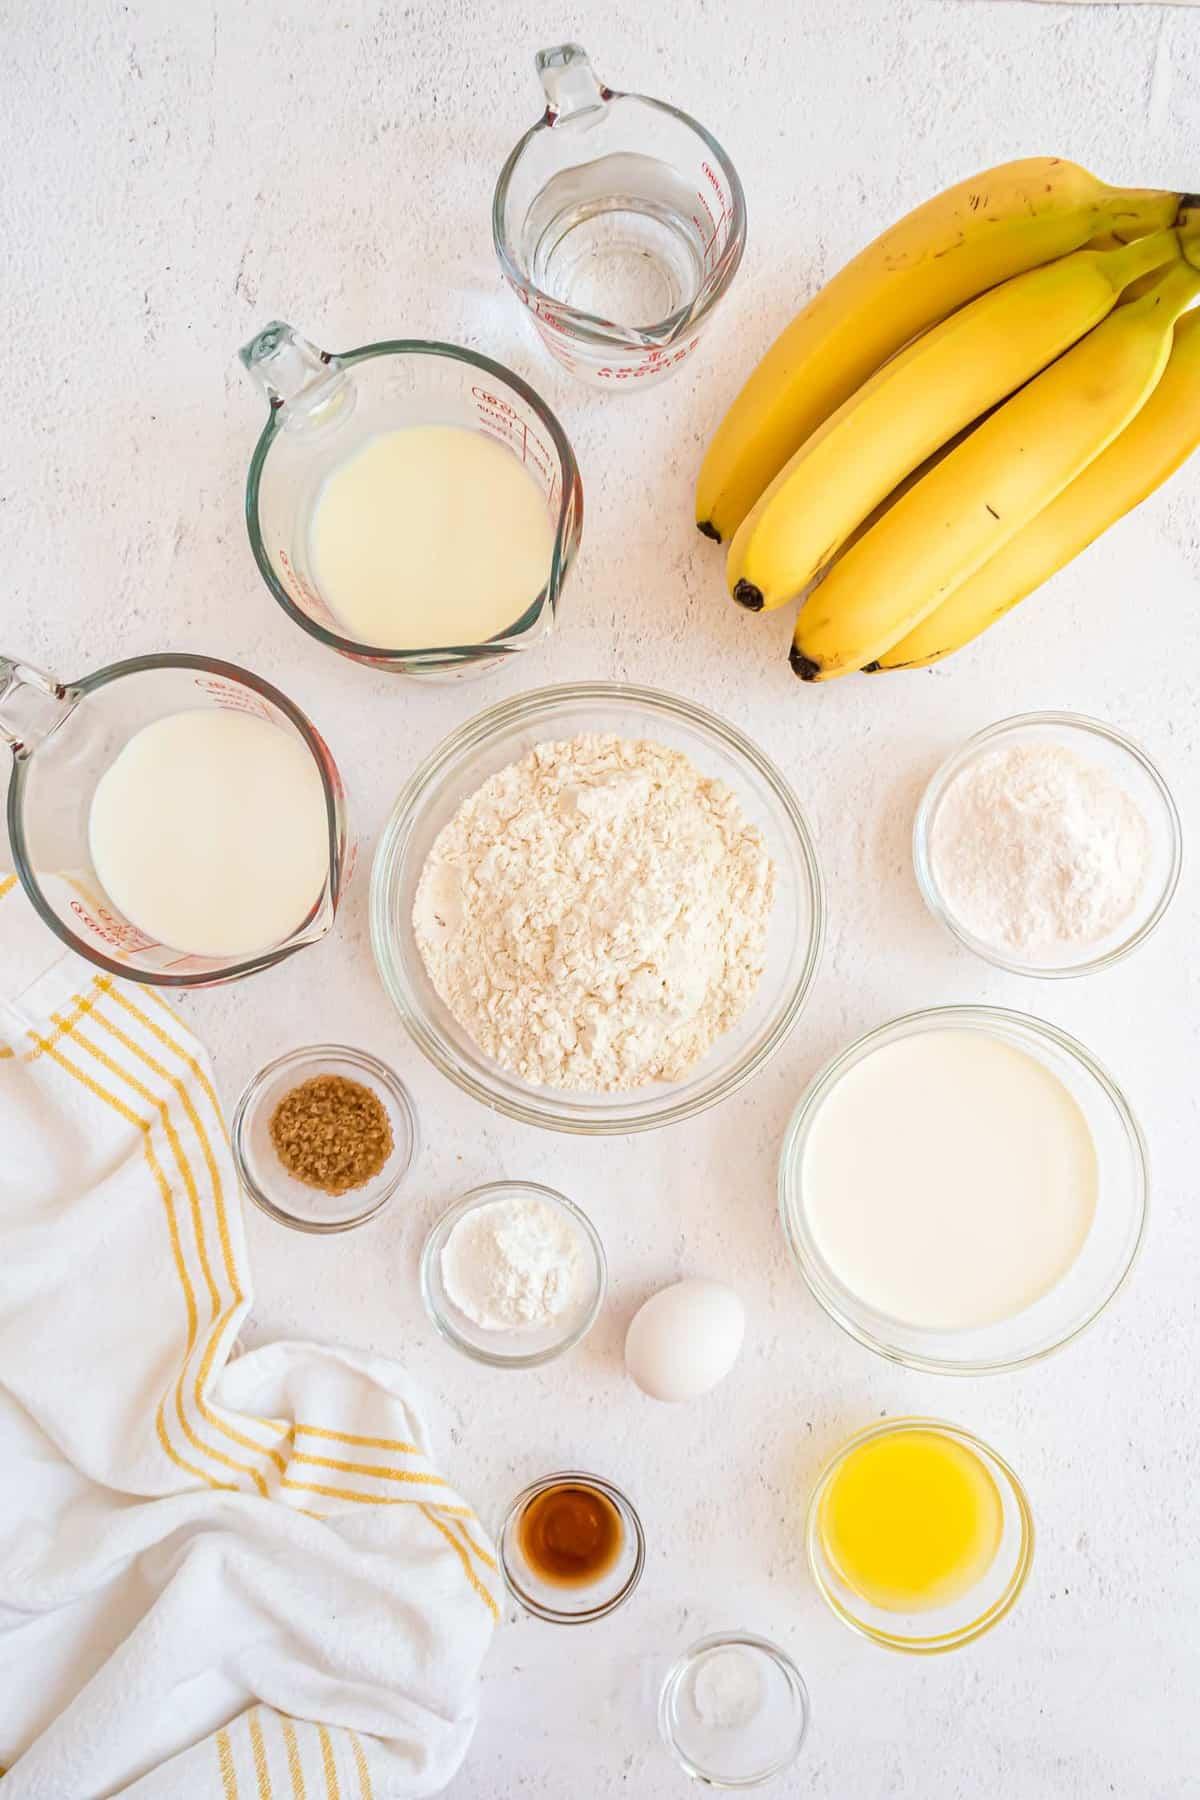 Overhead view of ingredients needed, including bananas.